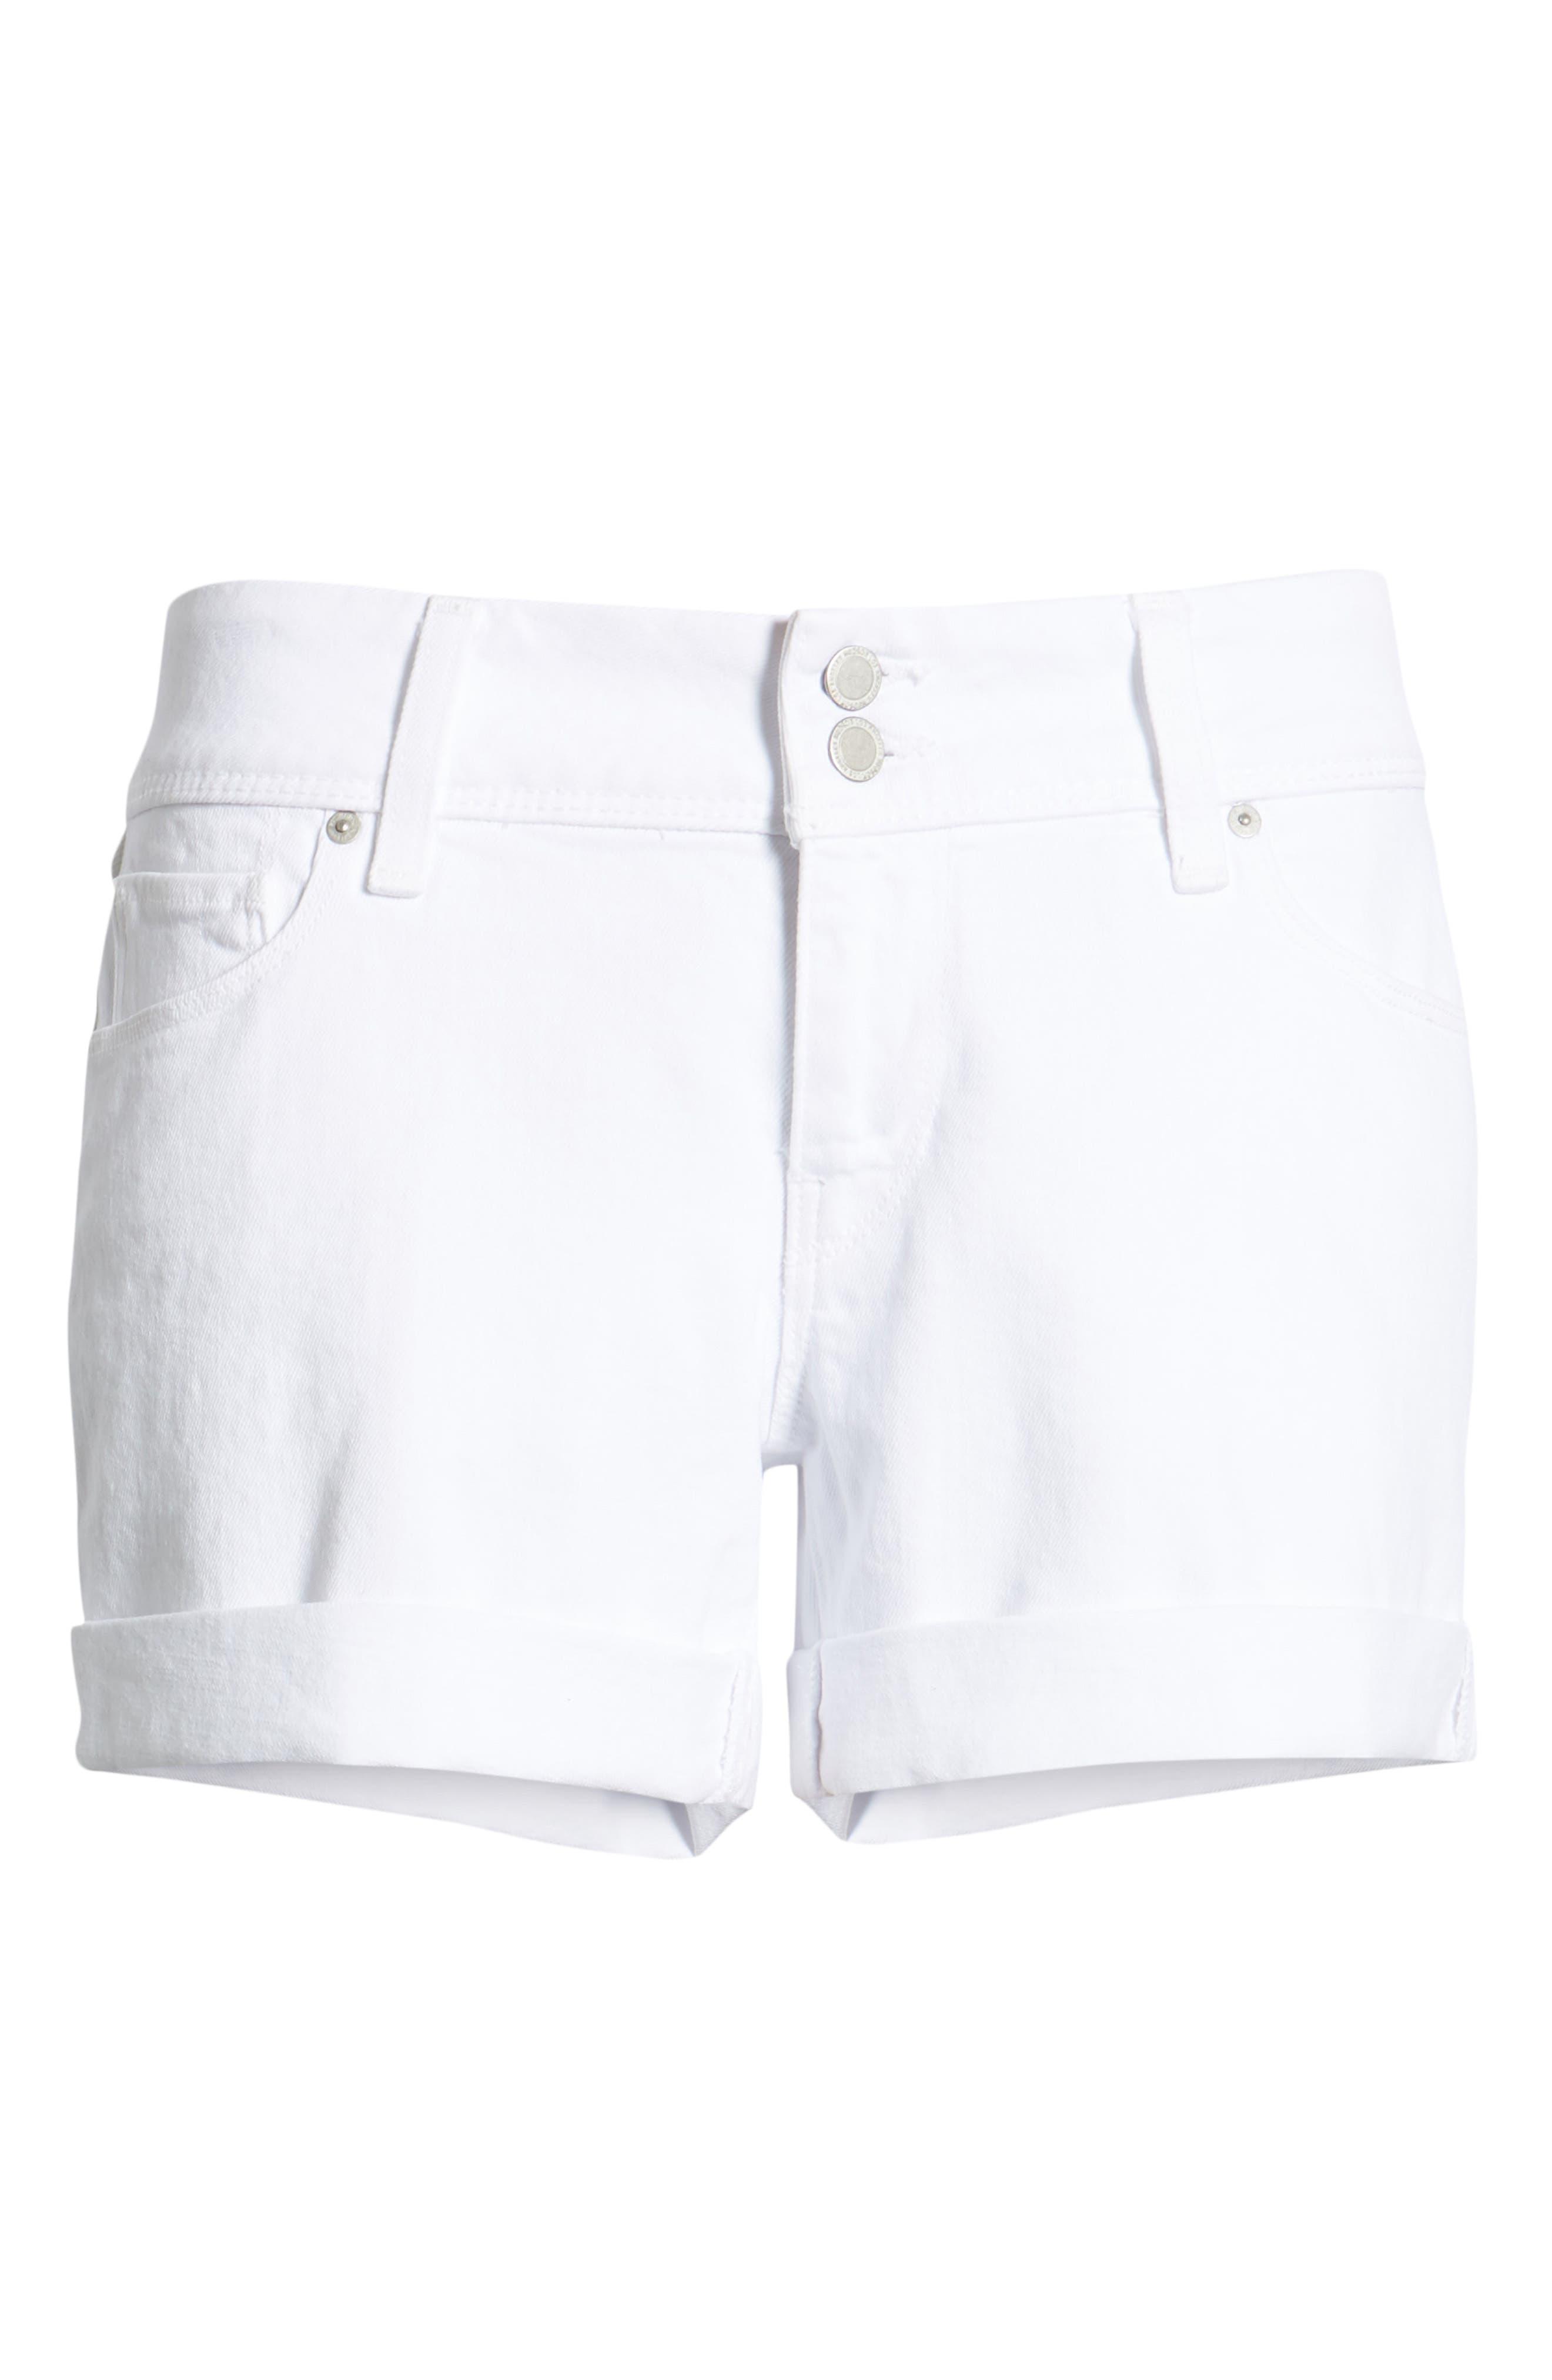 HUDSON JEANS, Croxley Cuff Denim Shorts, Alternate thumbnail 7, color, WHITE 2